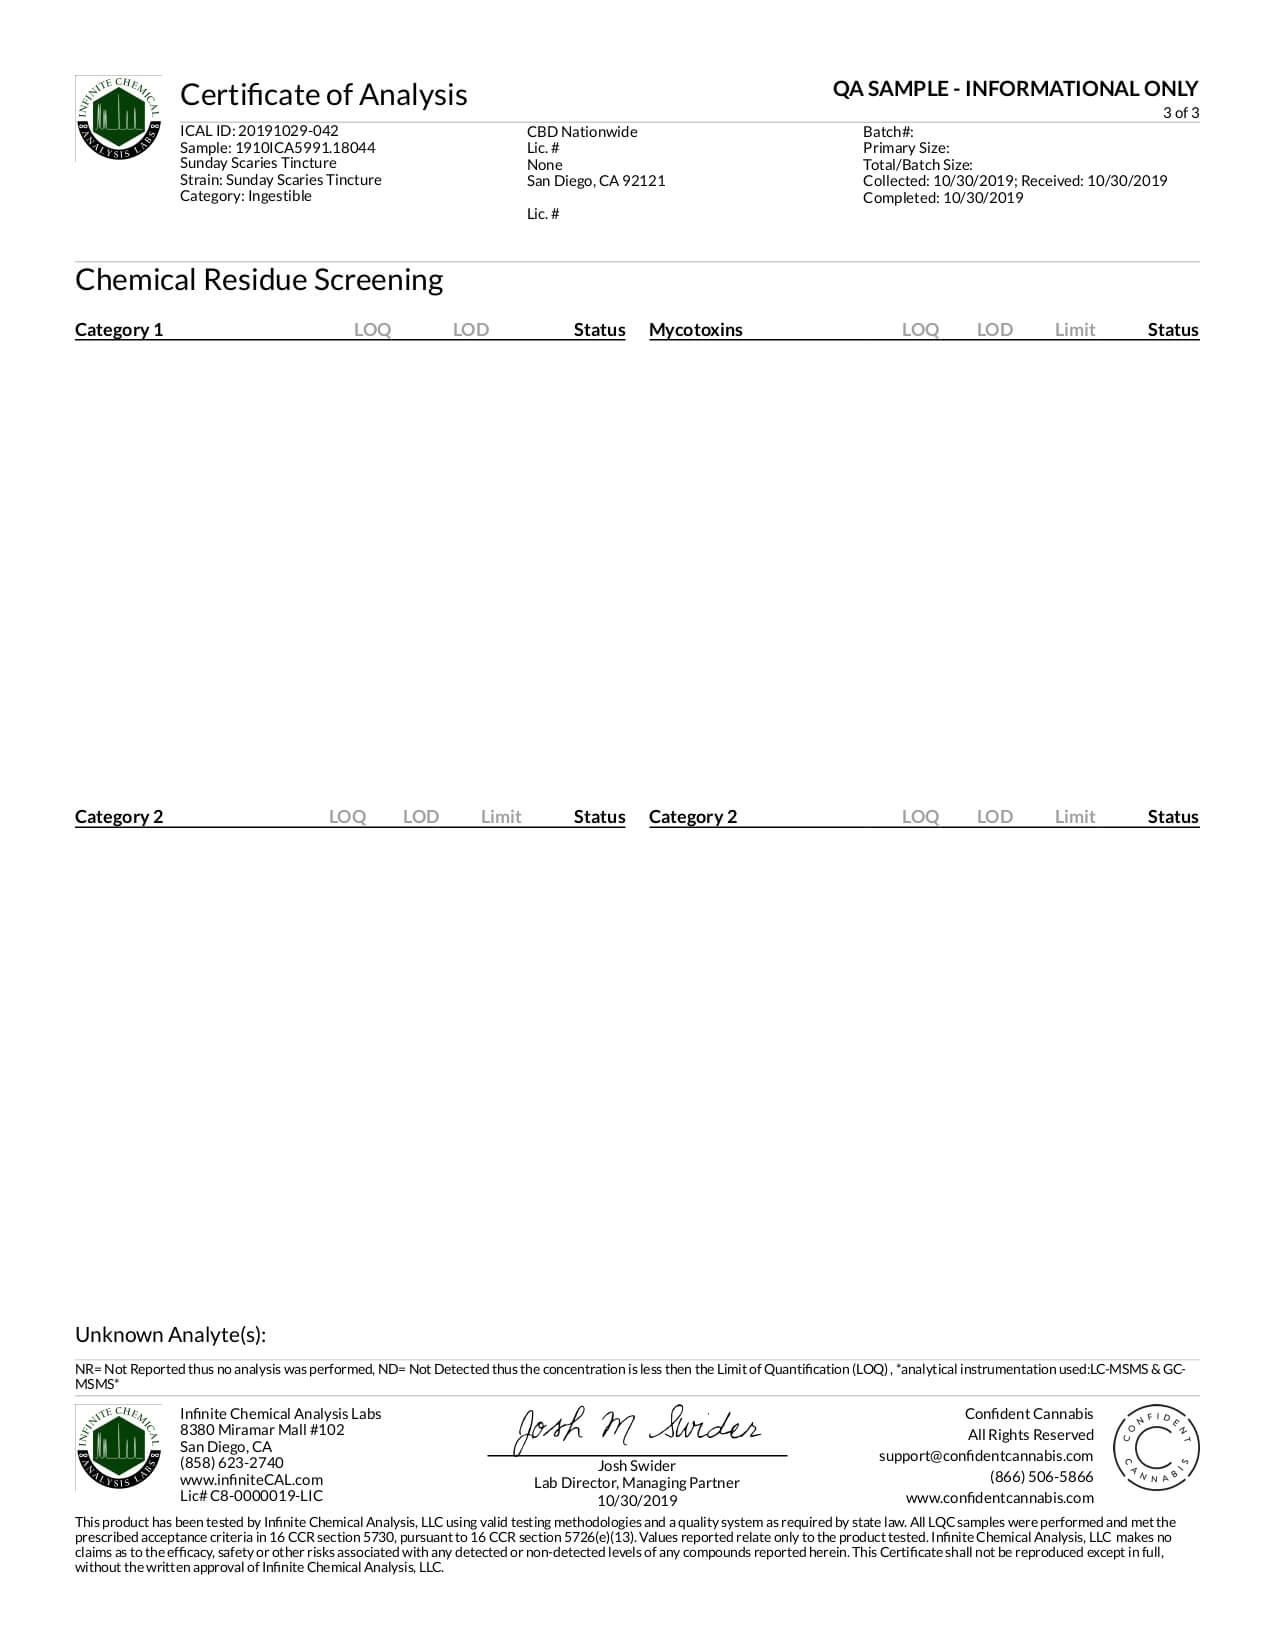 Sunday Scaries CBD Tincture Broad Spectrum w/Vitamins B12 & D3 Lab Report